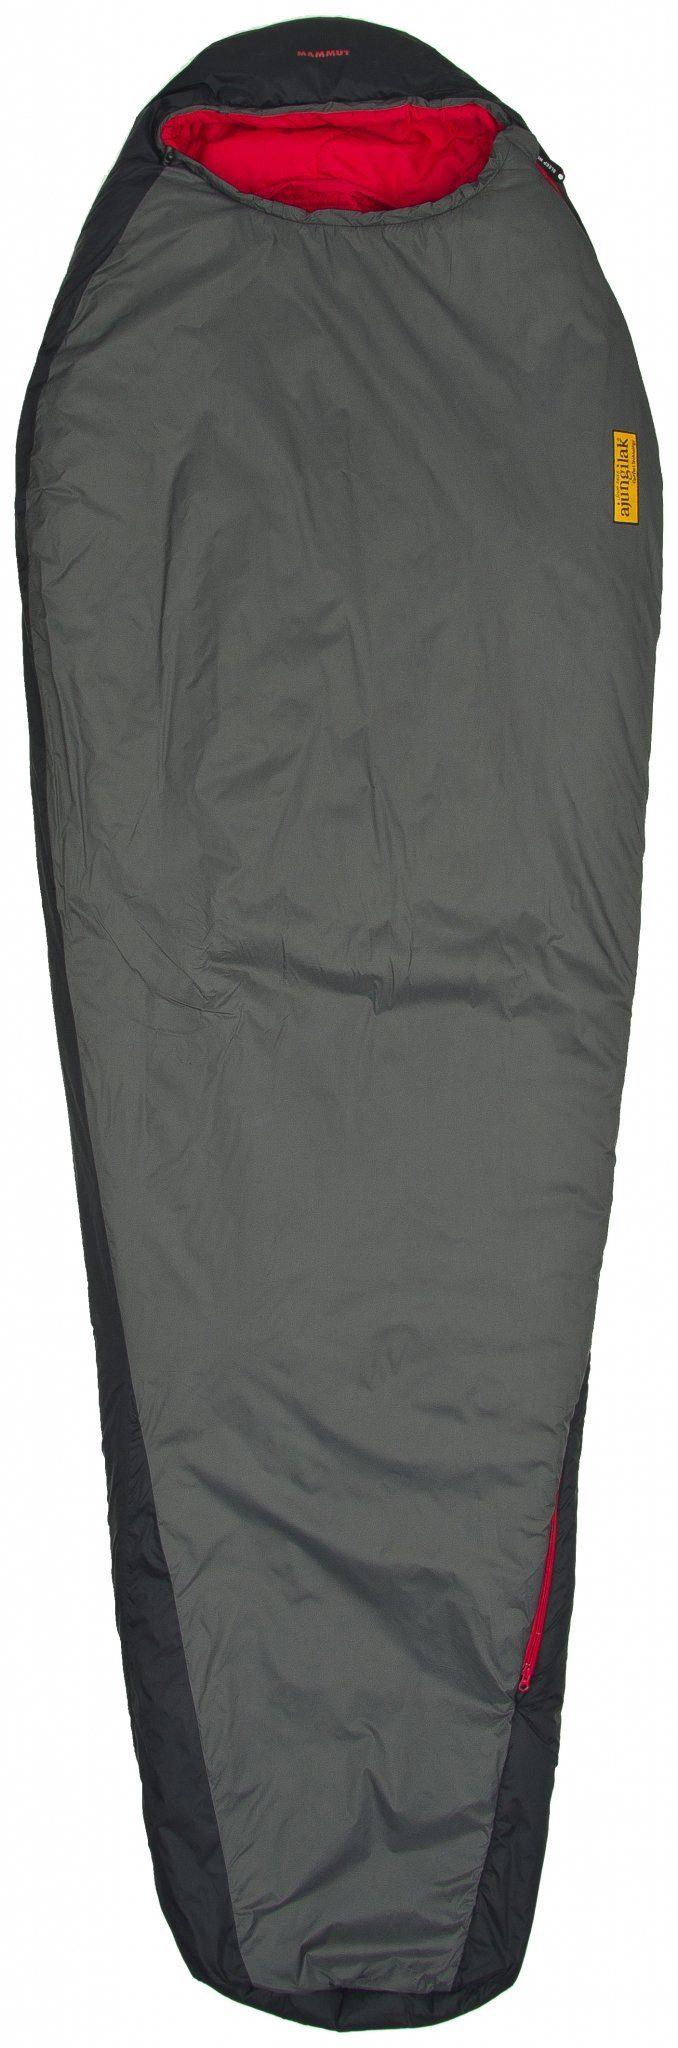 Mammut Schlafsack »Kompakt 3-Season 215 Sleeping Bag«